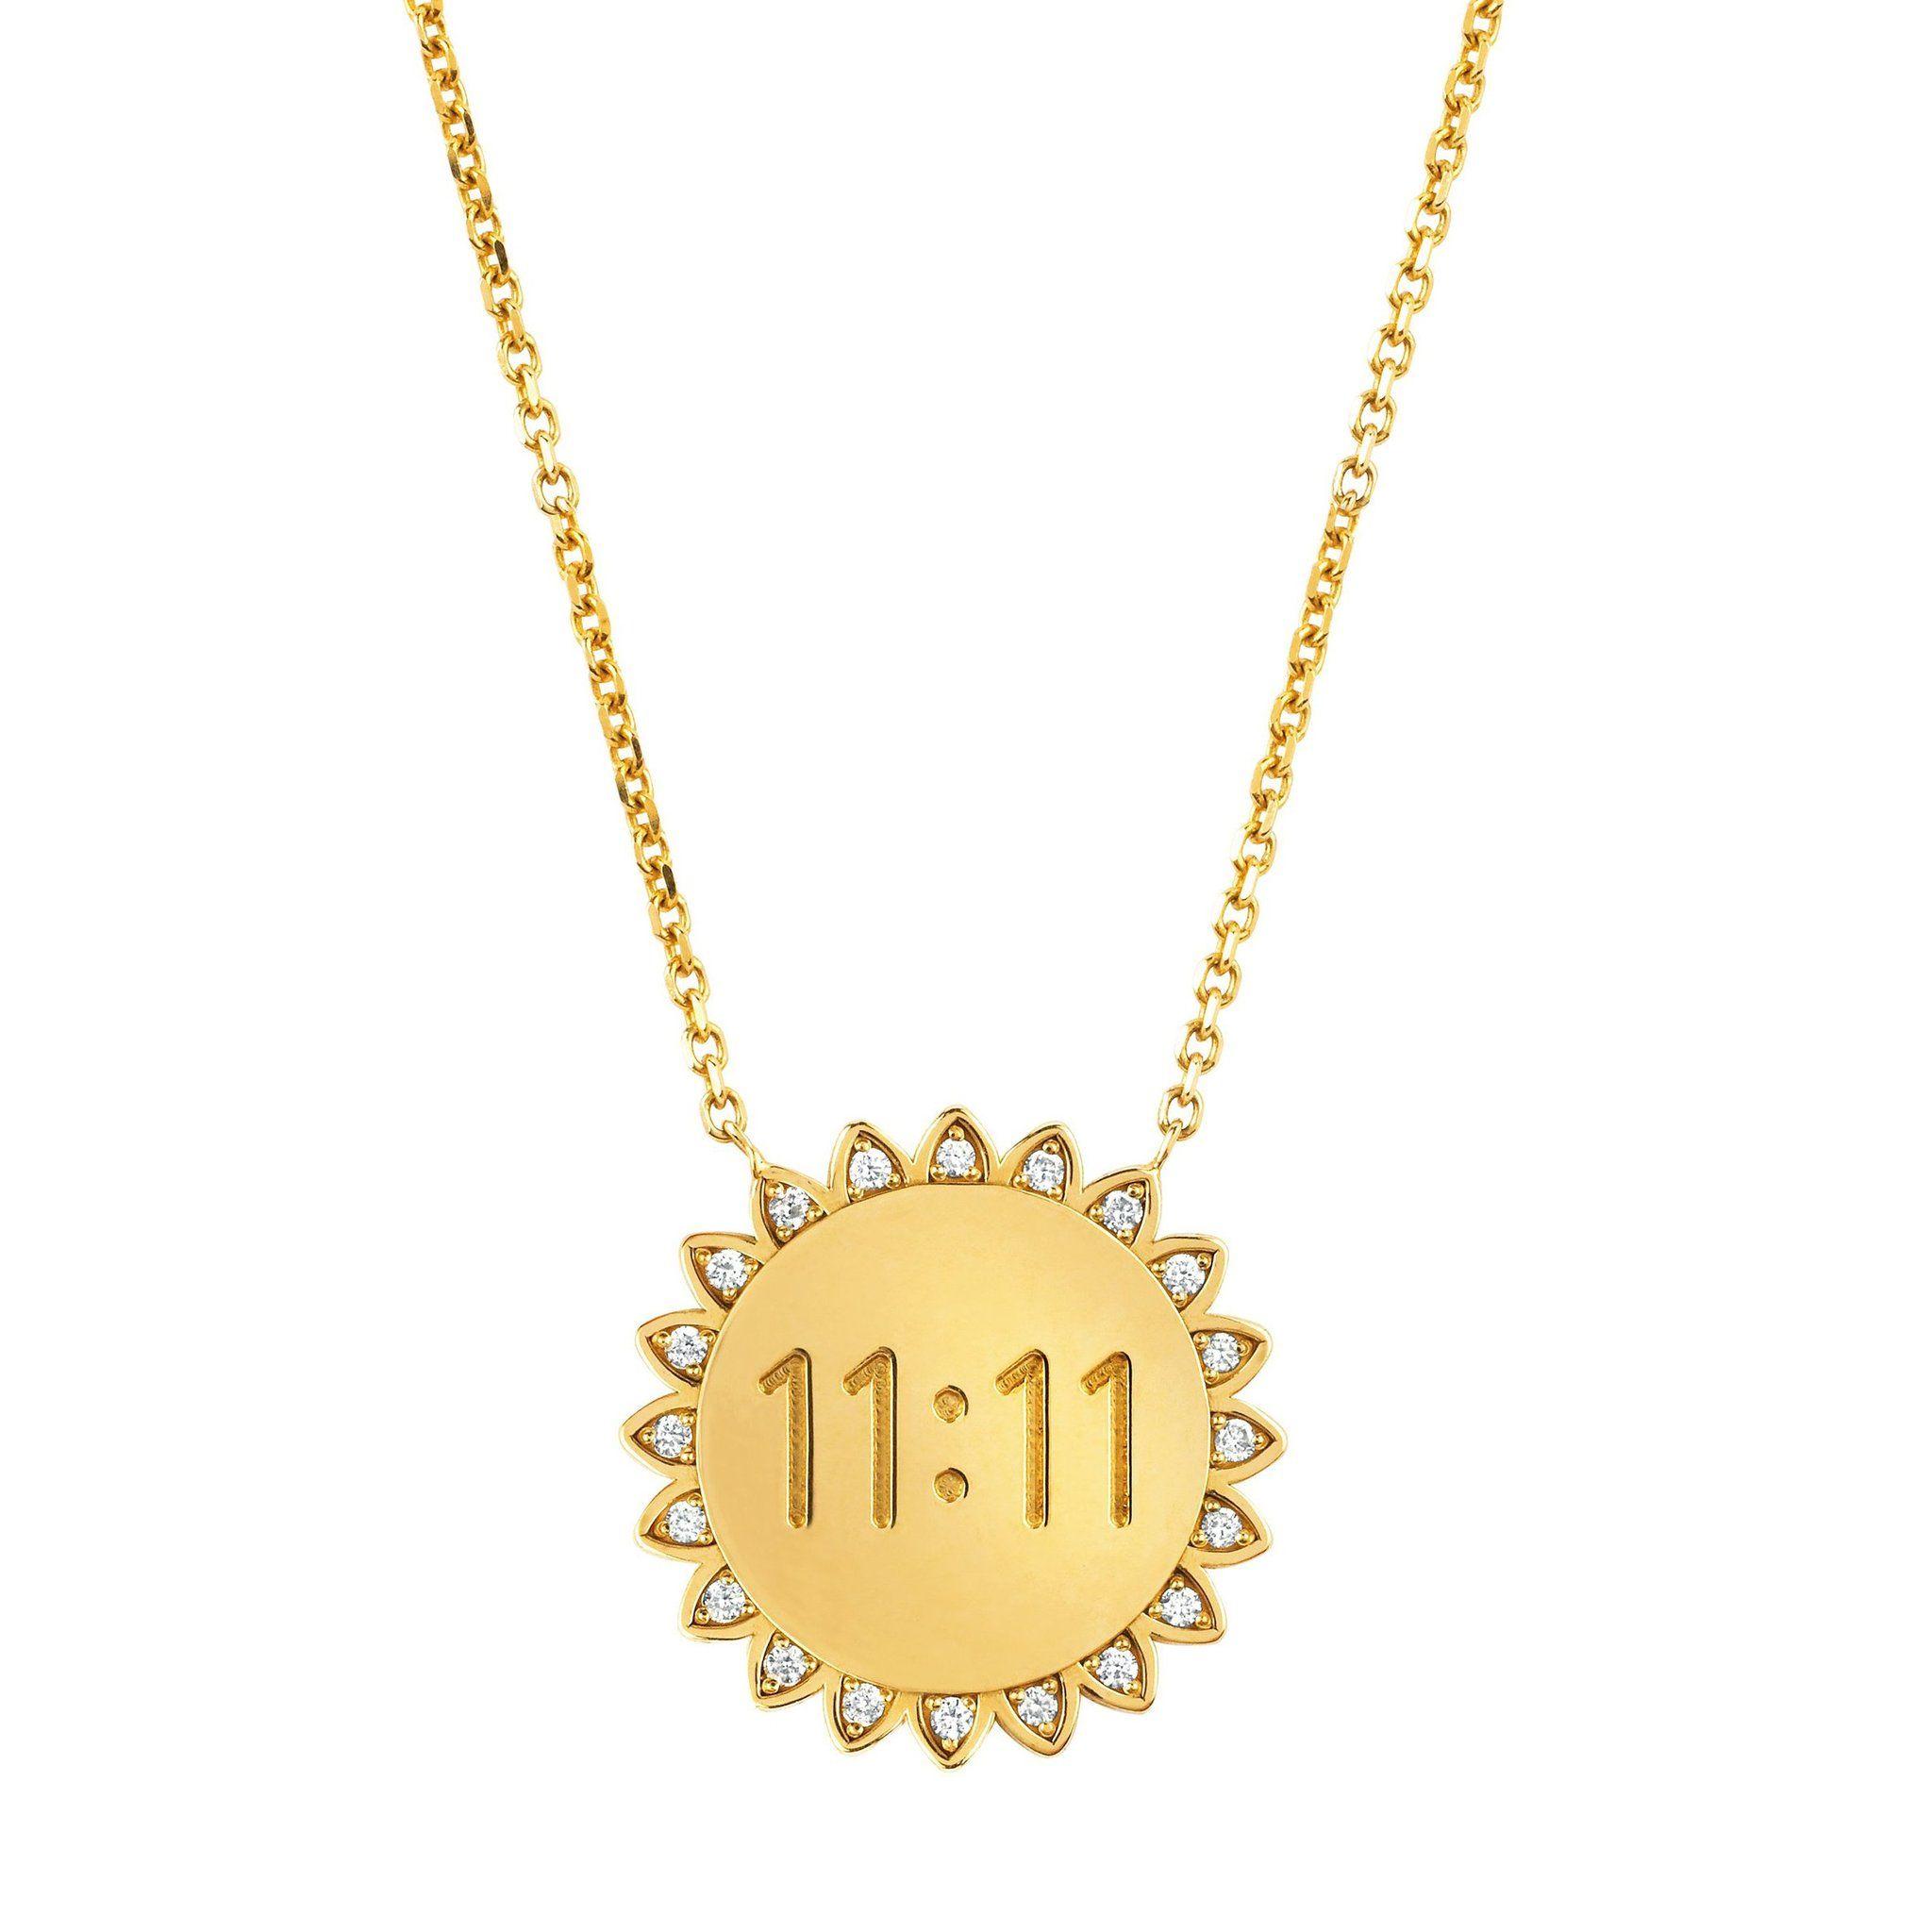 New Medium 11 11 Sunshine Necklace With Diamonds Sunshine Necklace Diamond Necklace